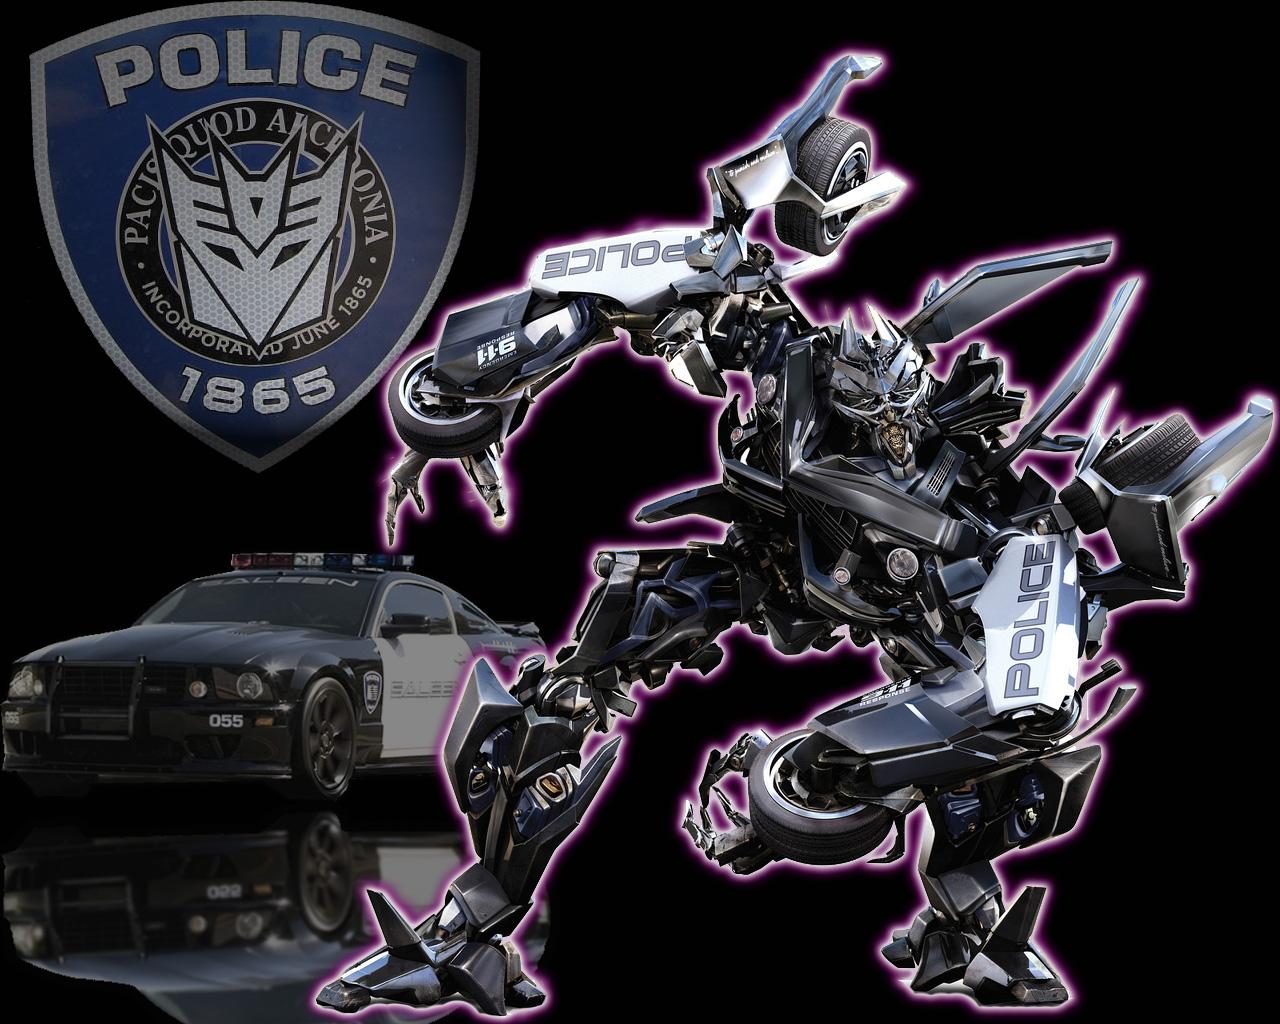 Transformers Movie Wallpaper ImageBankbiz 1280x1024